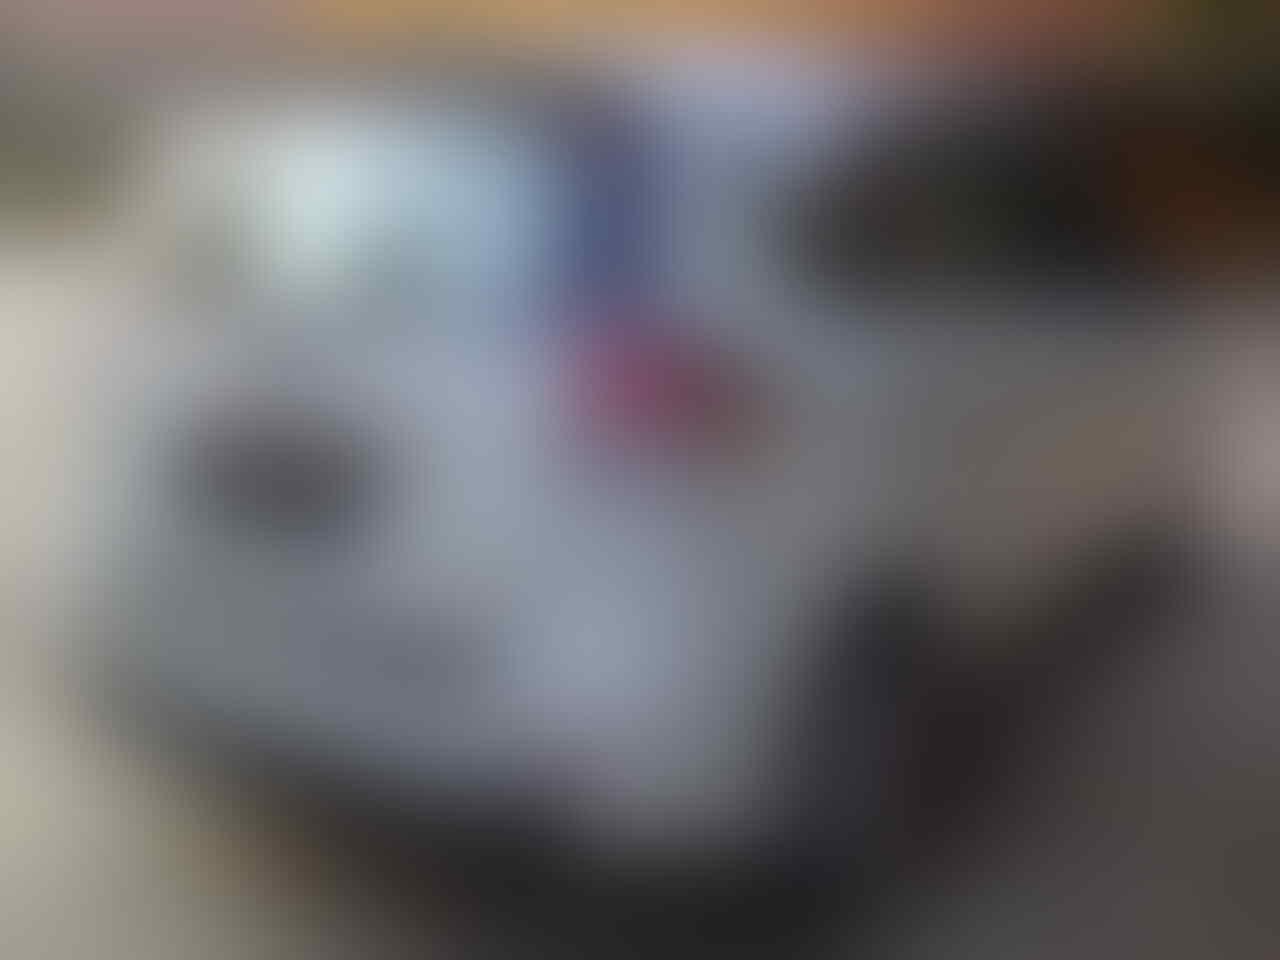 S3RIOUS - Suzuki Ertiga on Kaskus - Part 5